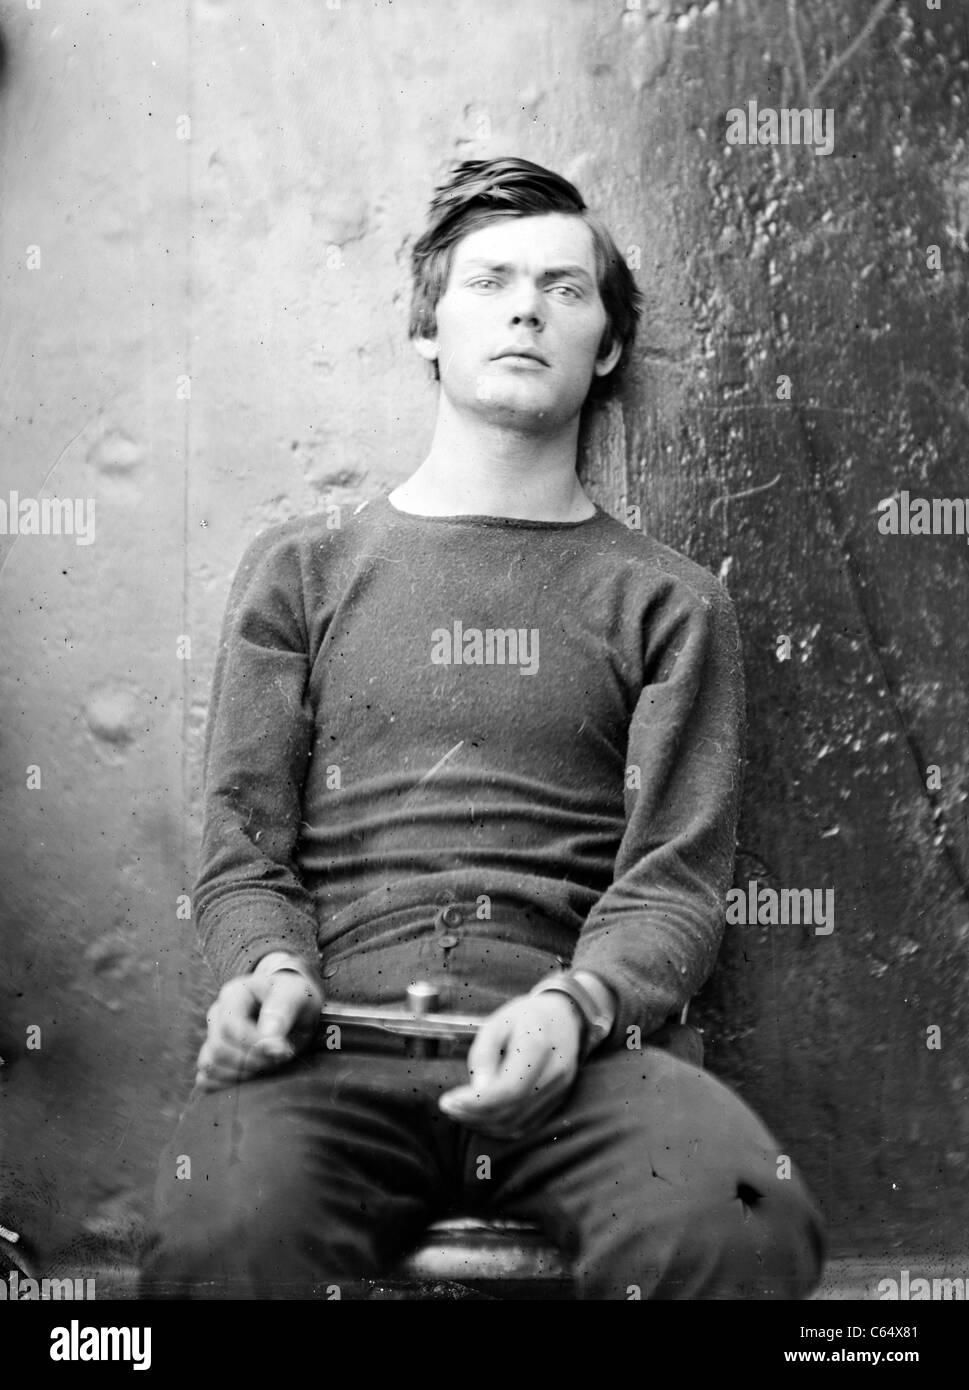 Thornton Lewis Powell, Lewis Paine, Lewis Payne, uno dei cospiratori nell'assassinio del Presidente Lincoln. Immagini Stock